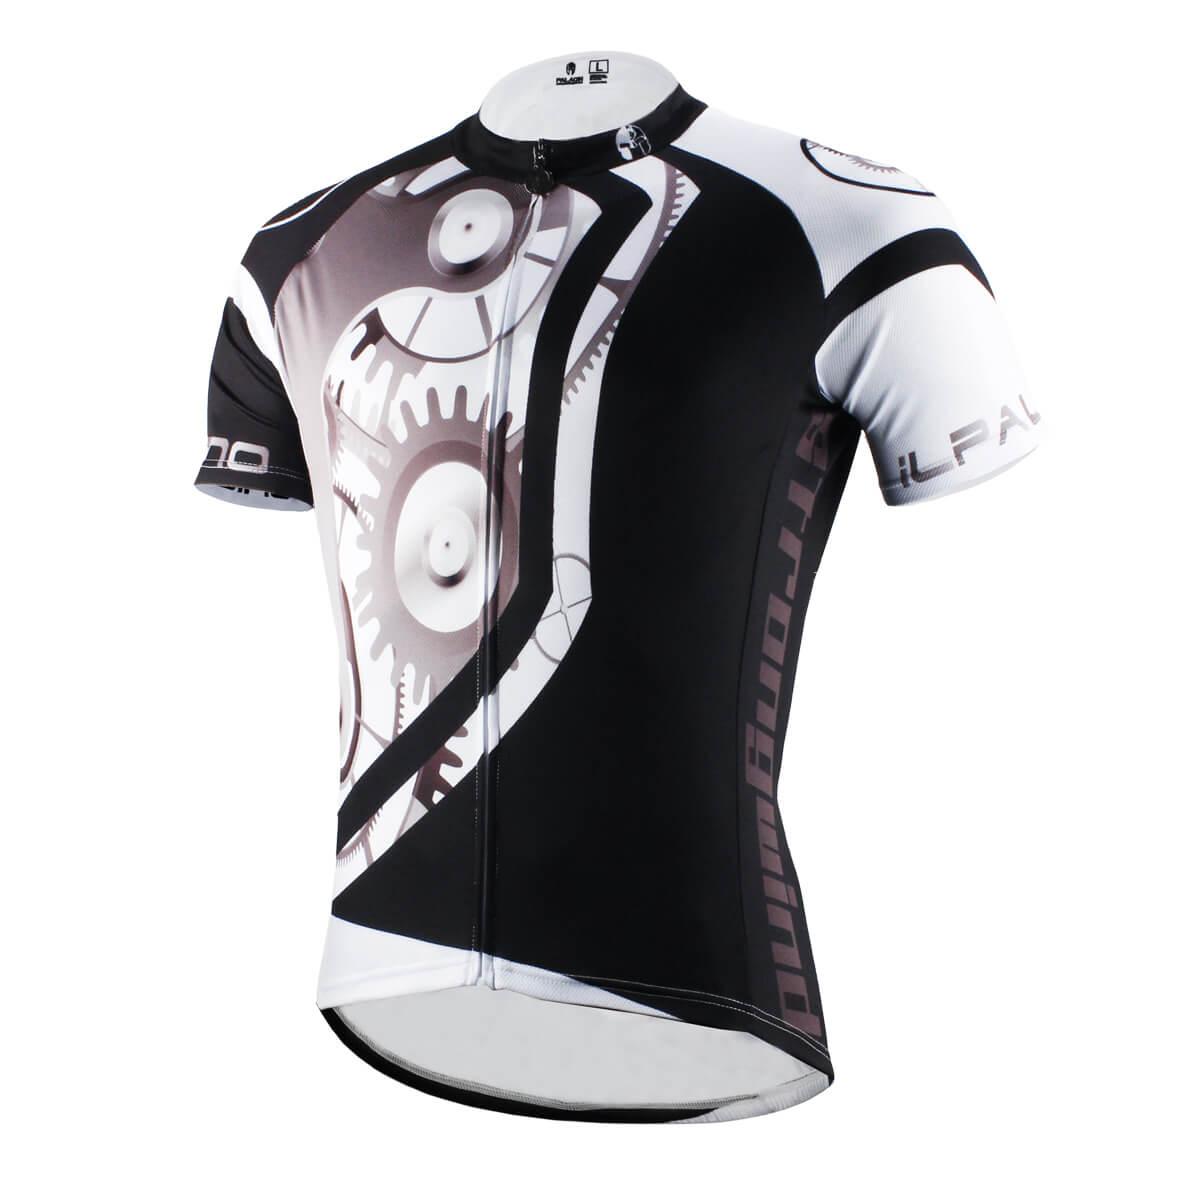 Unique Mechanical Gears Bike Jersey For Men S Chogory